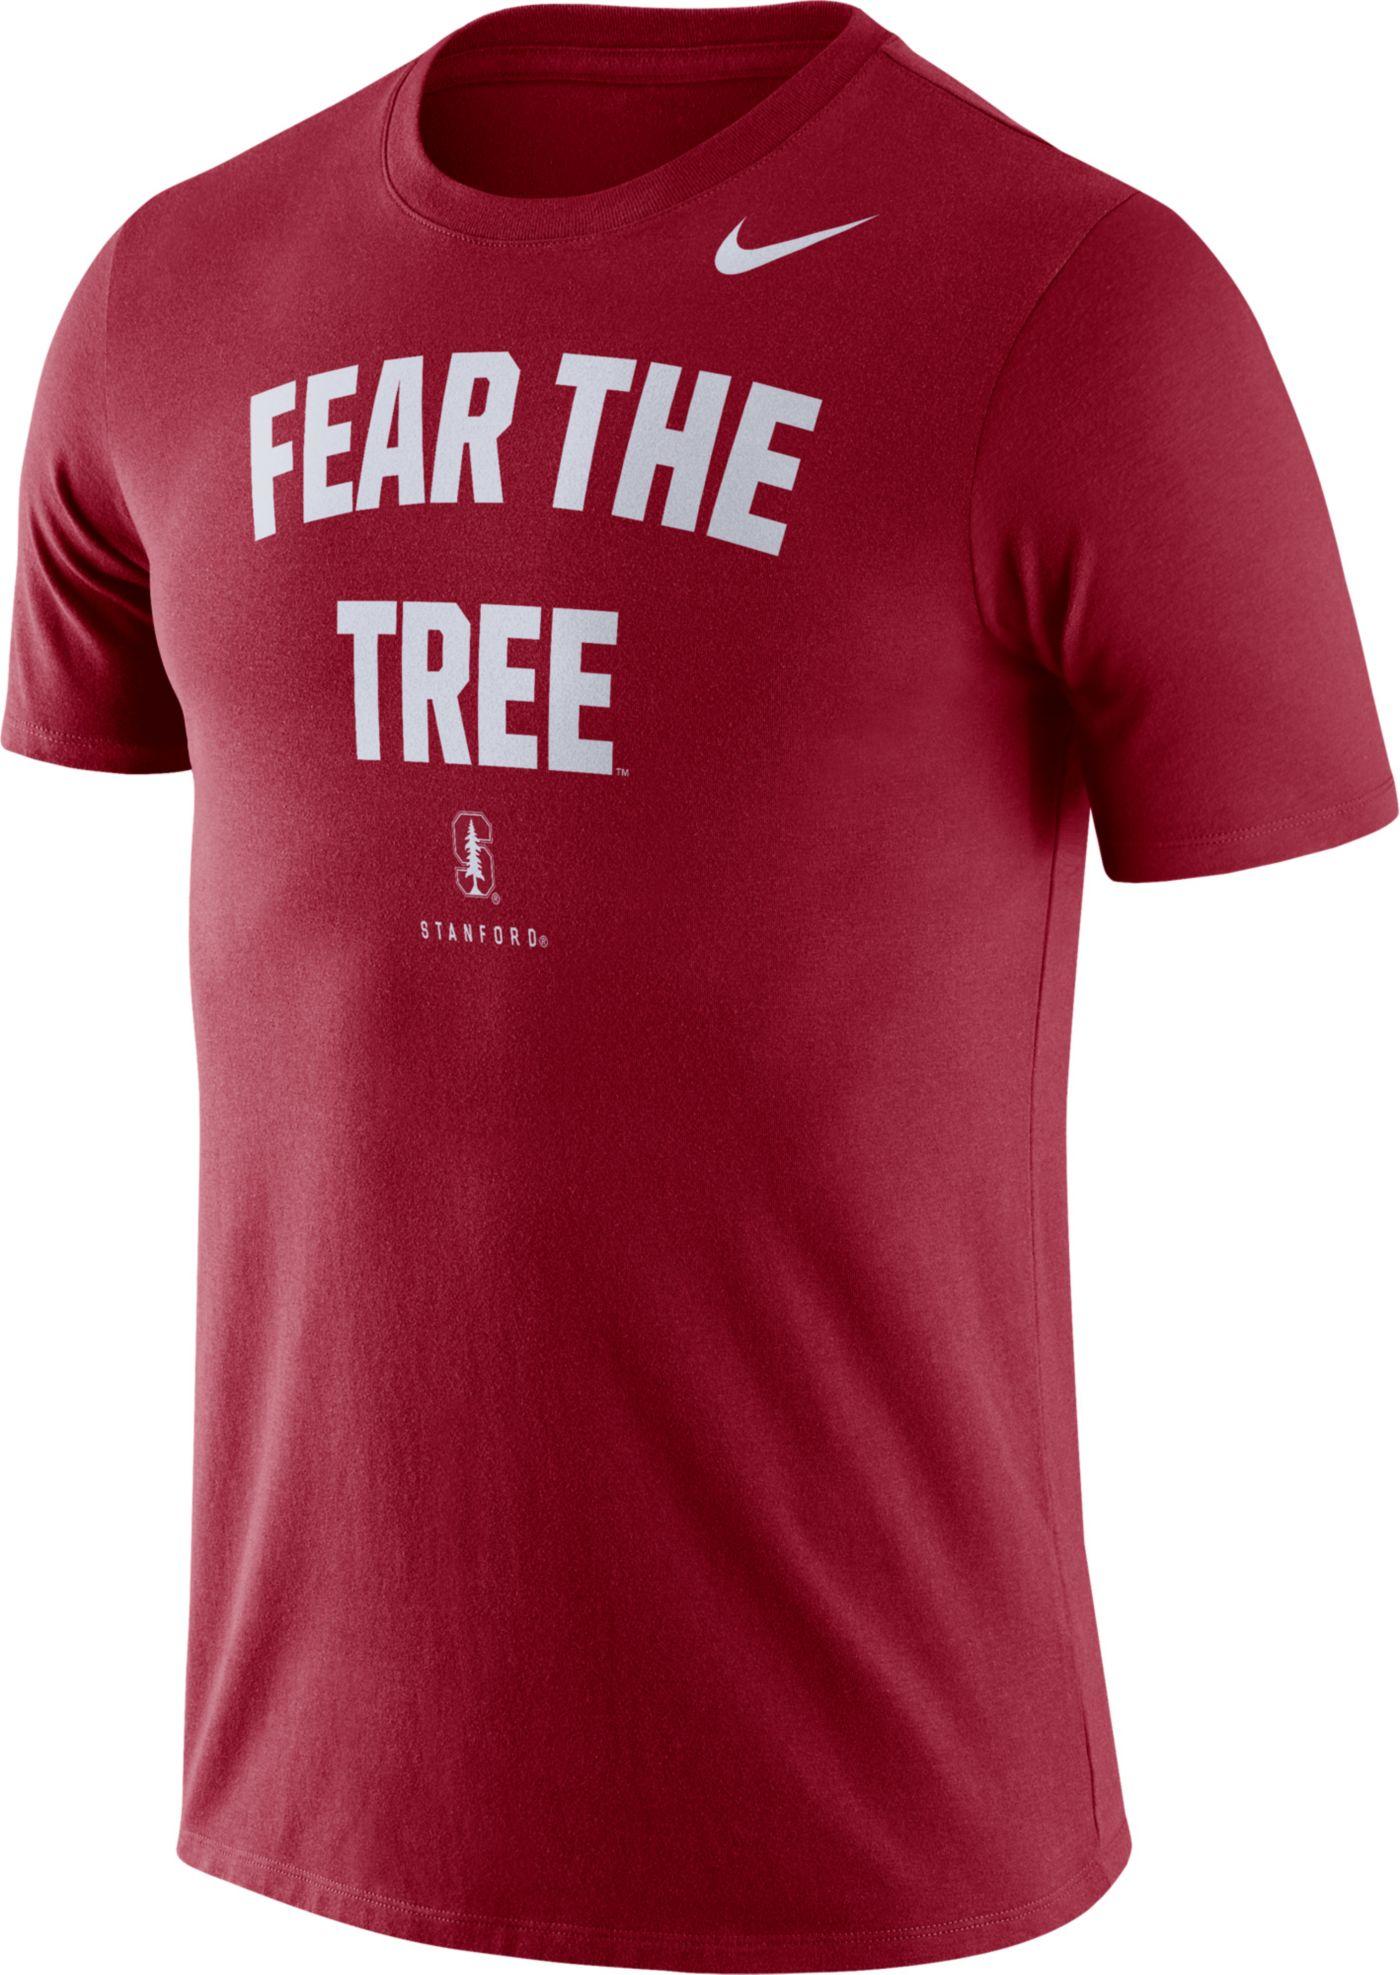 Nike Men's Stanford Cardinal Dri-FIT Phrase Cardinal T-Shirt